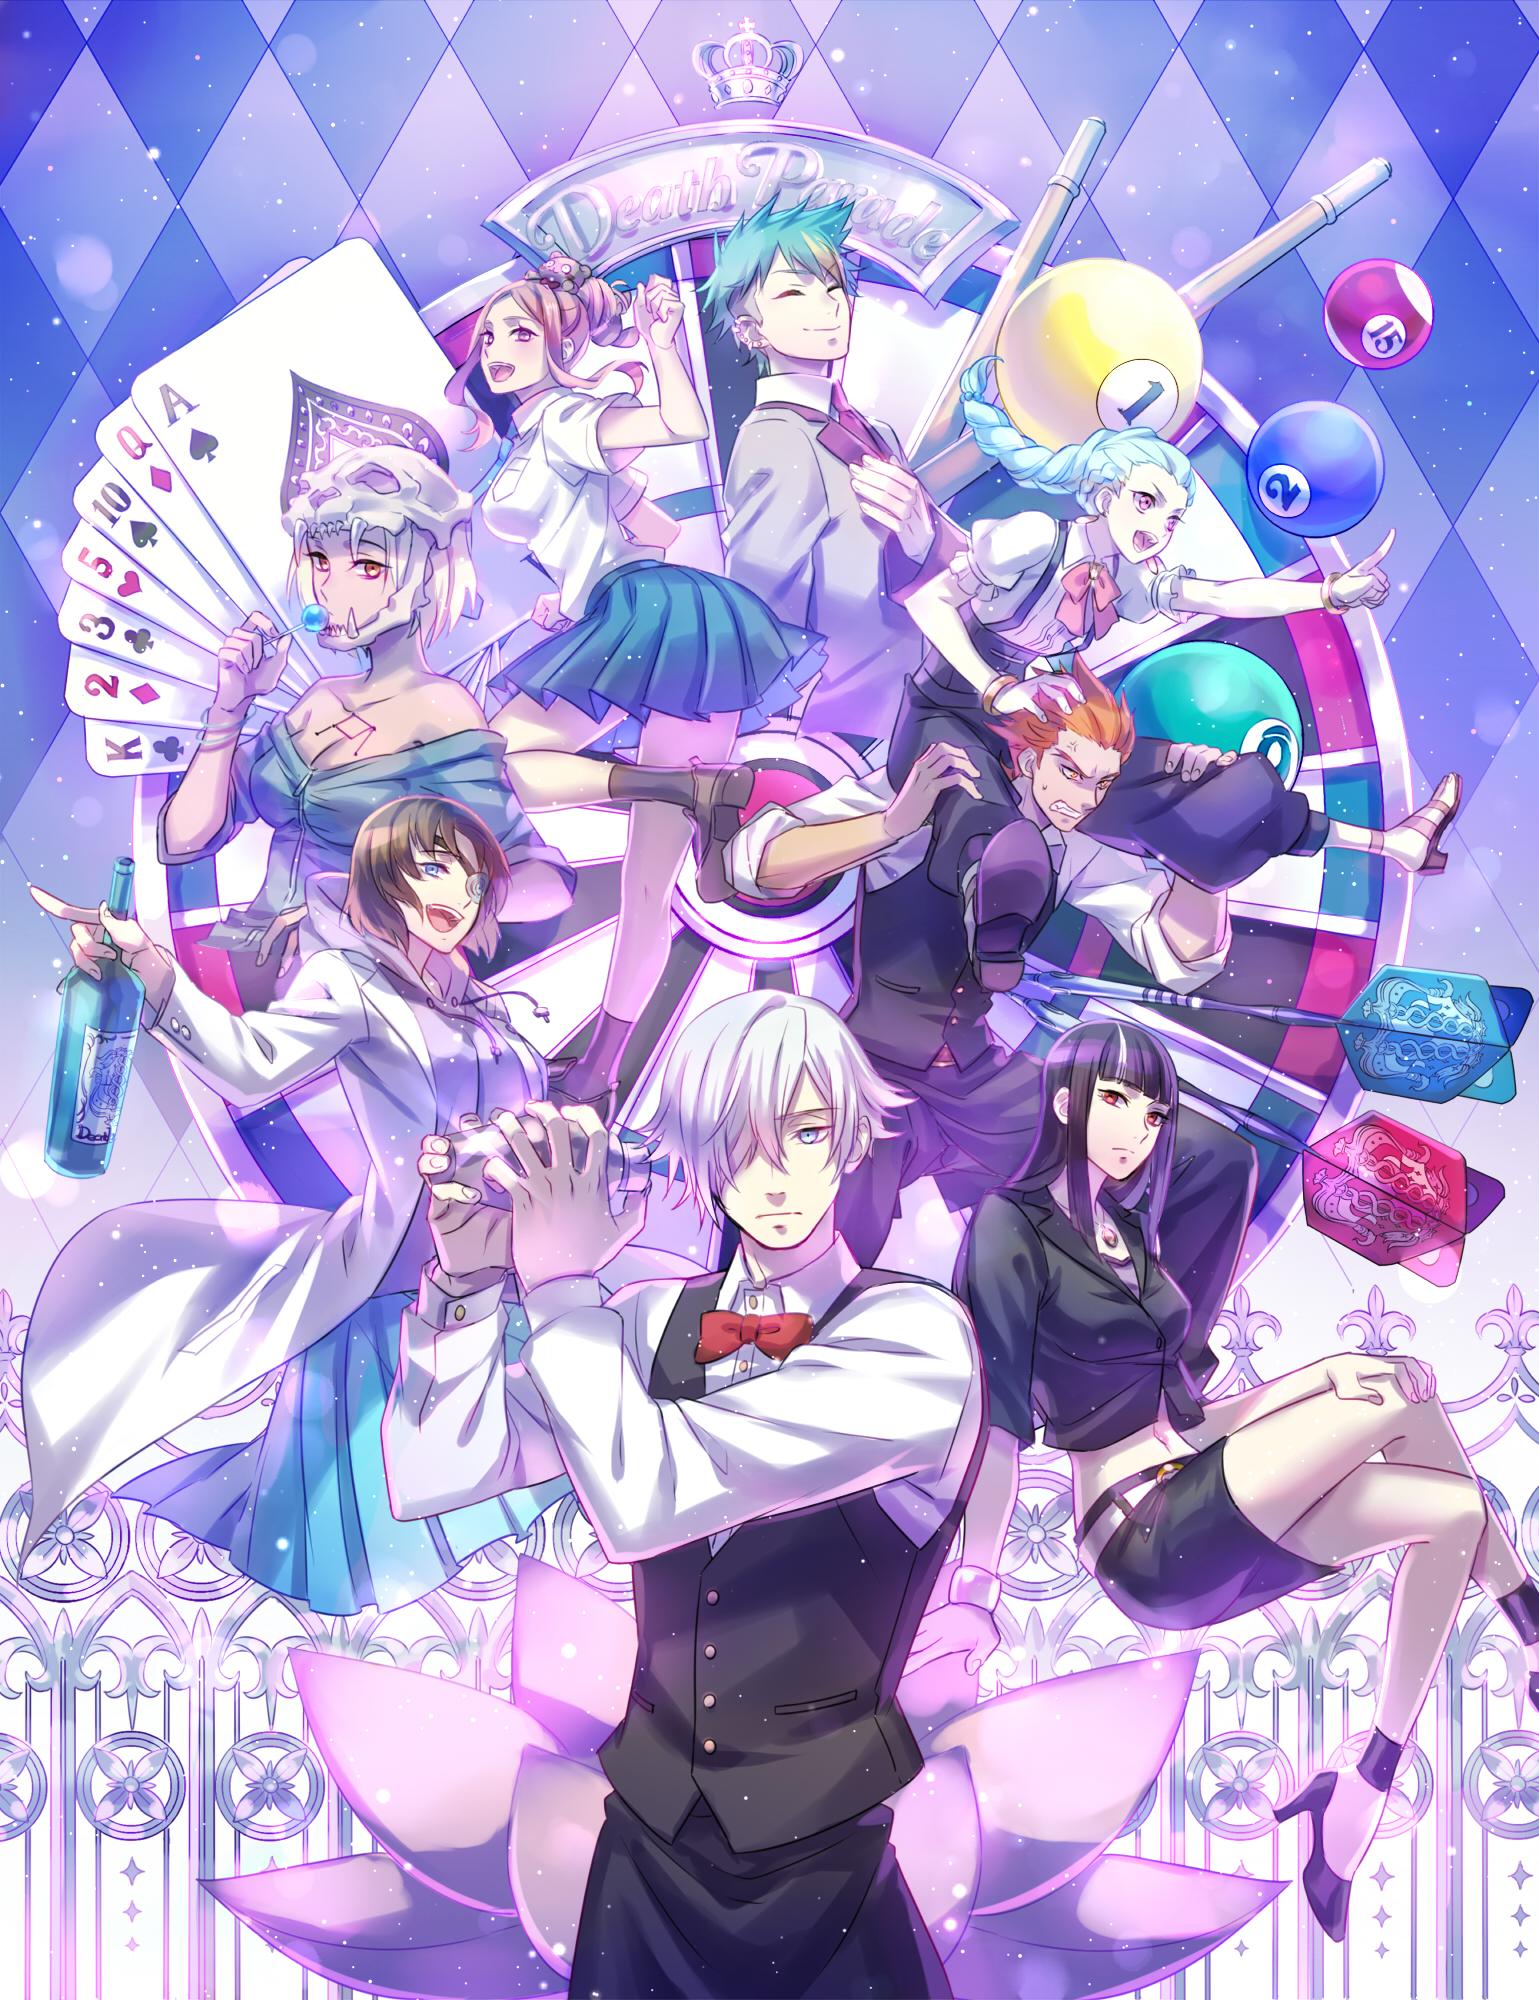 Kurokami No Onna Nona Decim Ginti Castra And 3 More Death Parade Drawn By Zoff Daria Danbooru